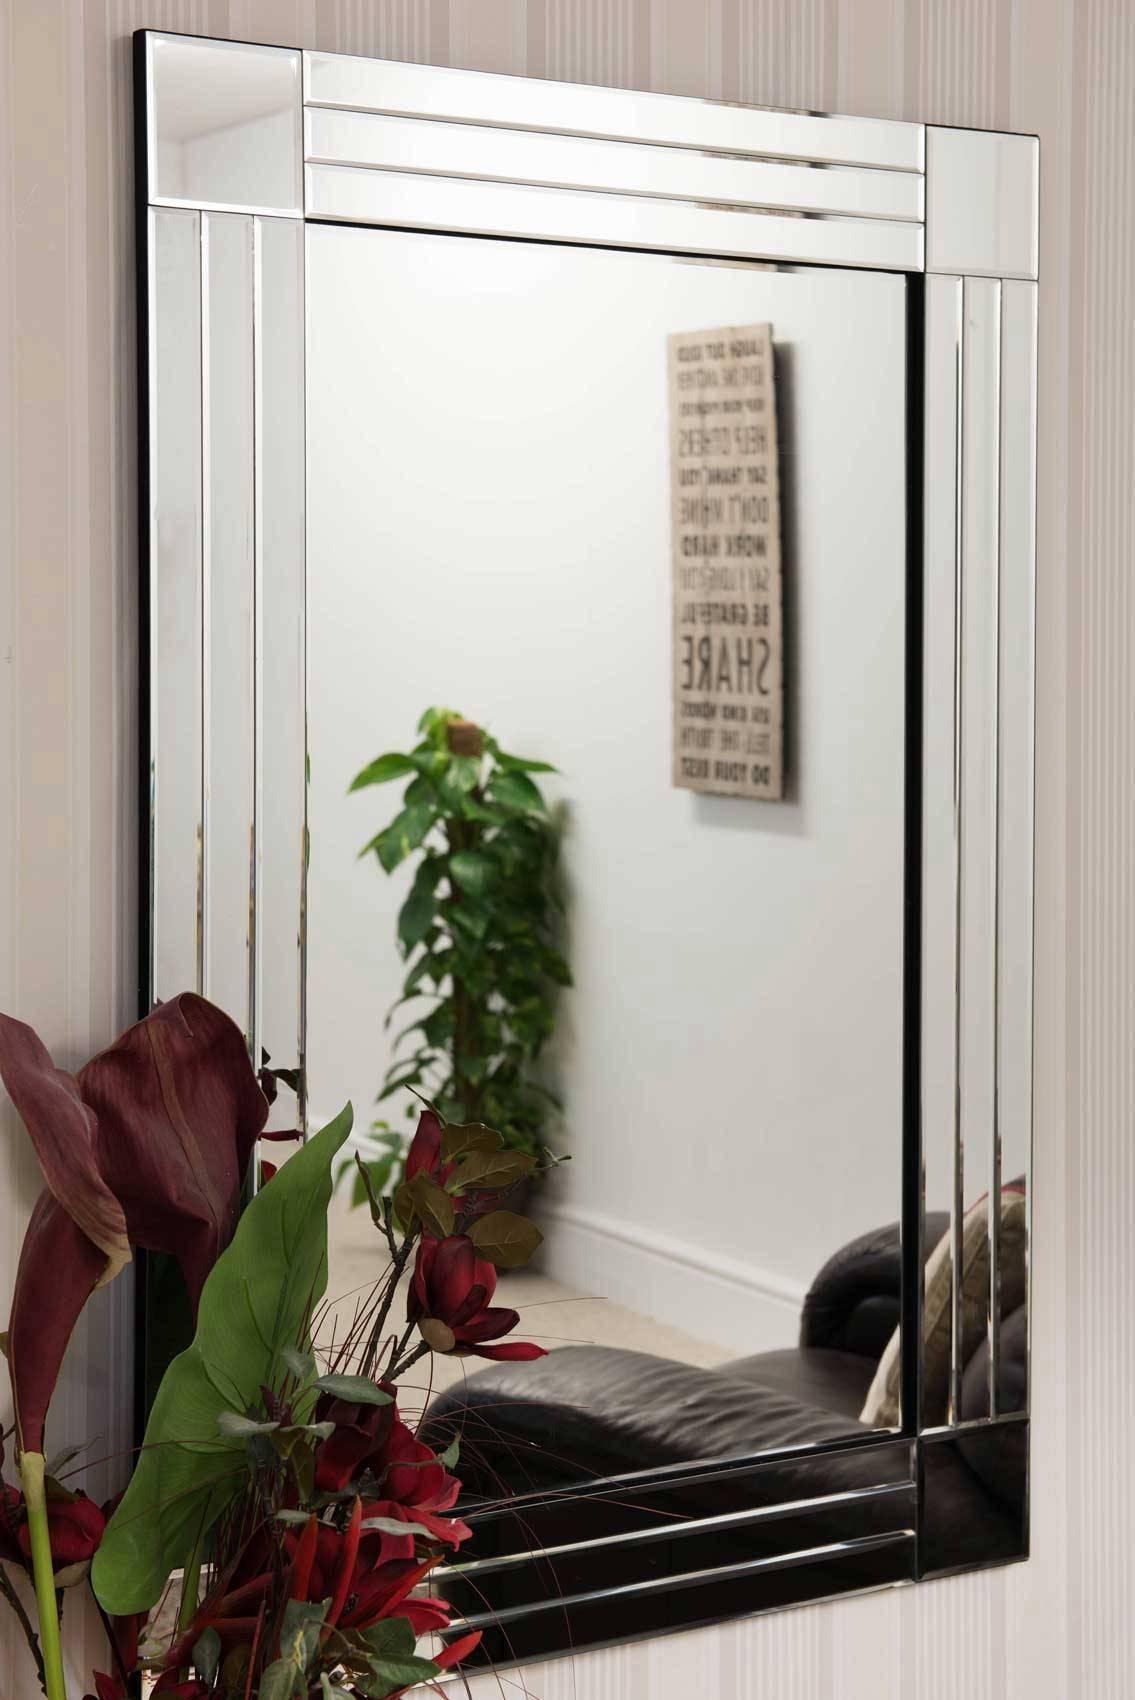 Ashwater Full Length Venetian Mirror 120x80cm – Soraya Interiors Uk Within Venetian Full Length Mirrors (View 10 of 15)